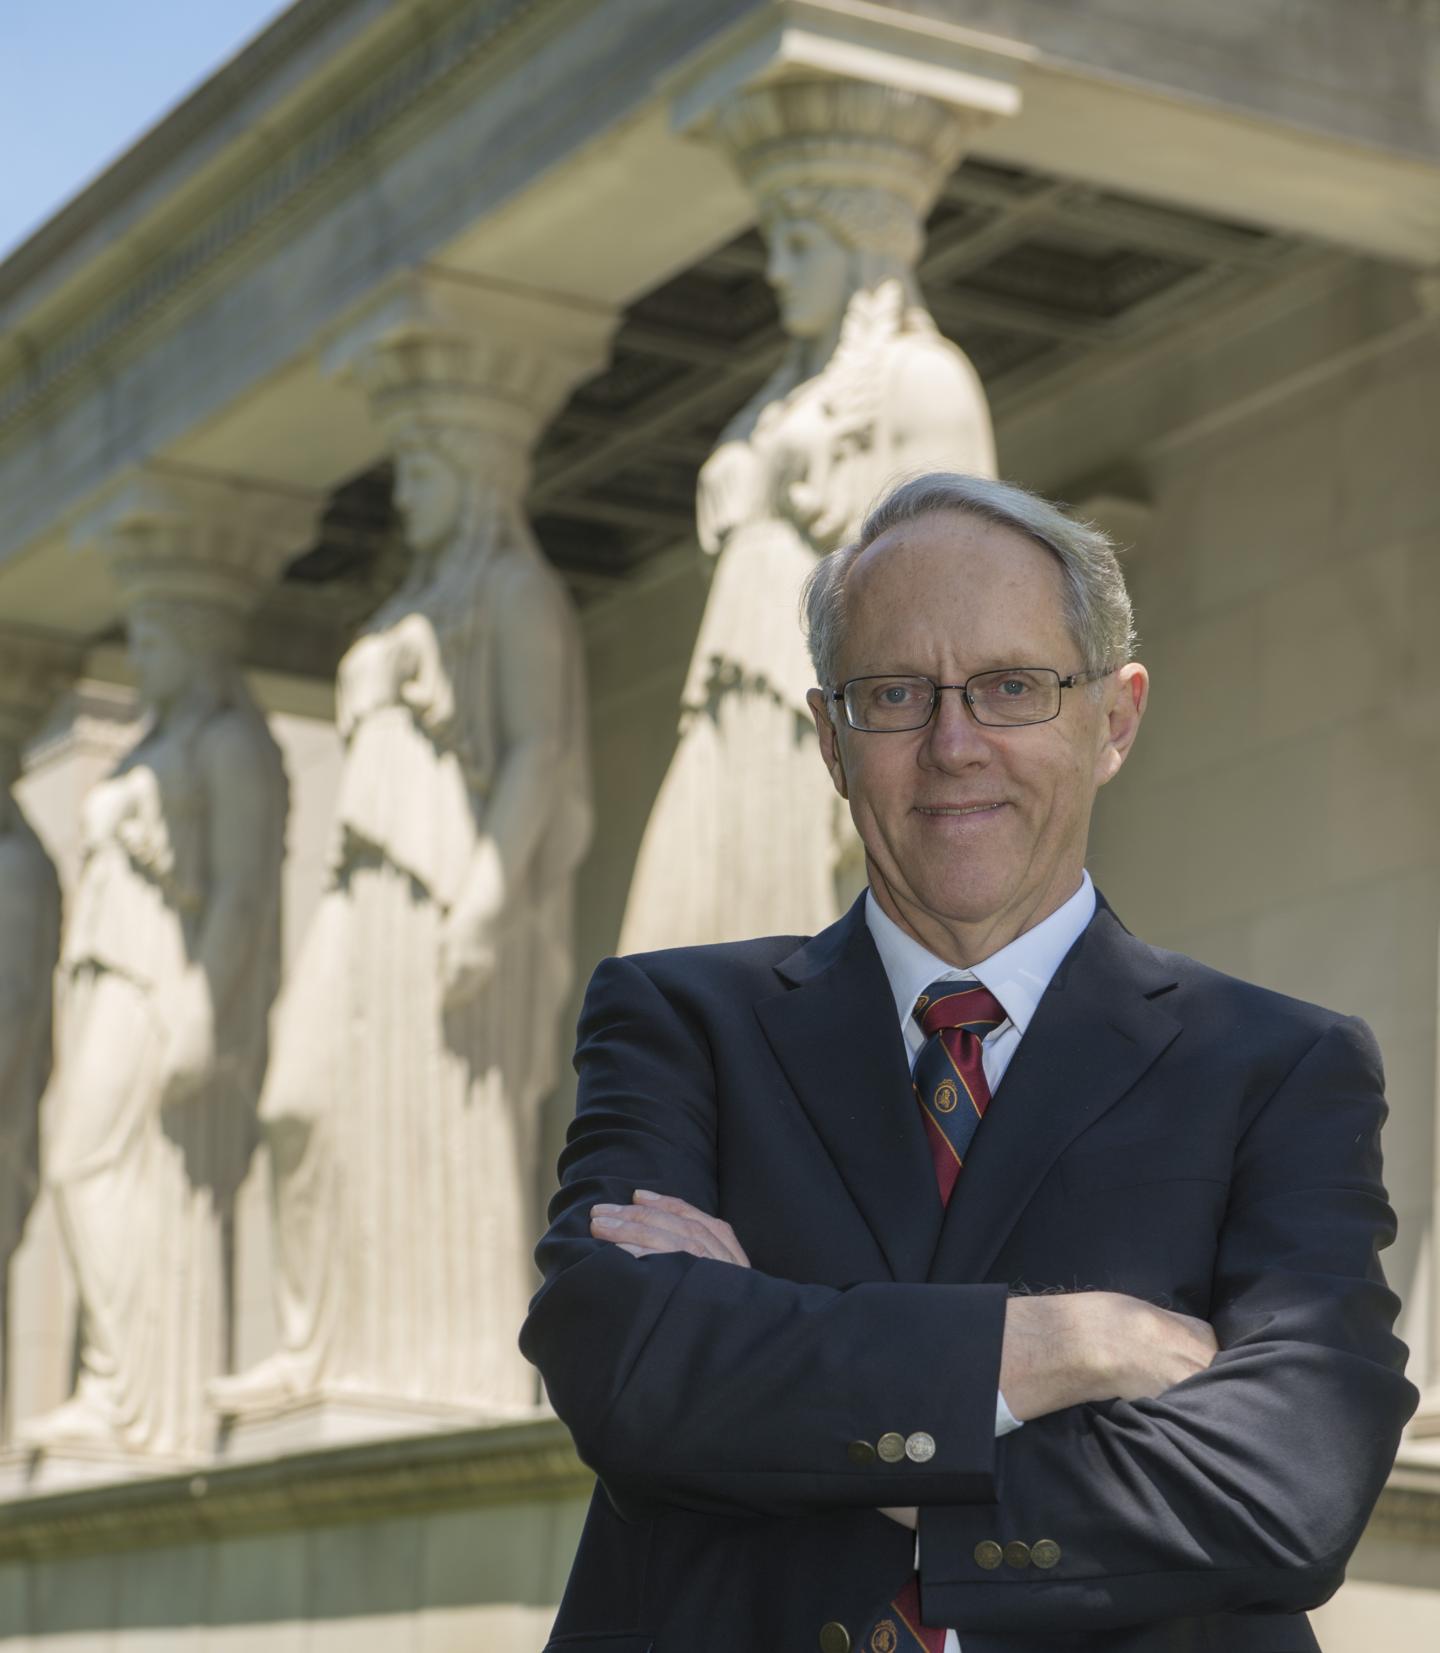 Author Describes the Intellectual Terrain of Statistics